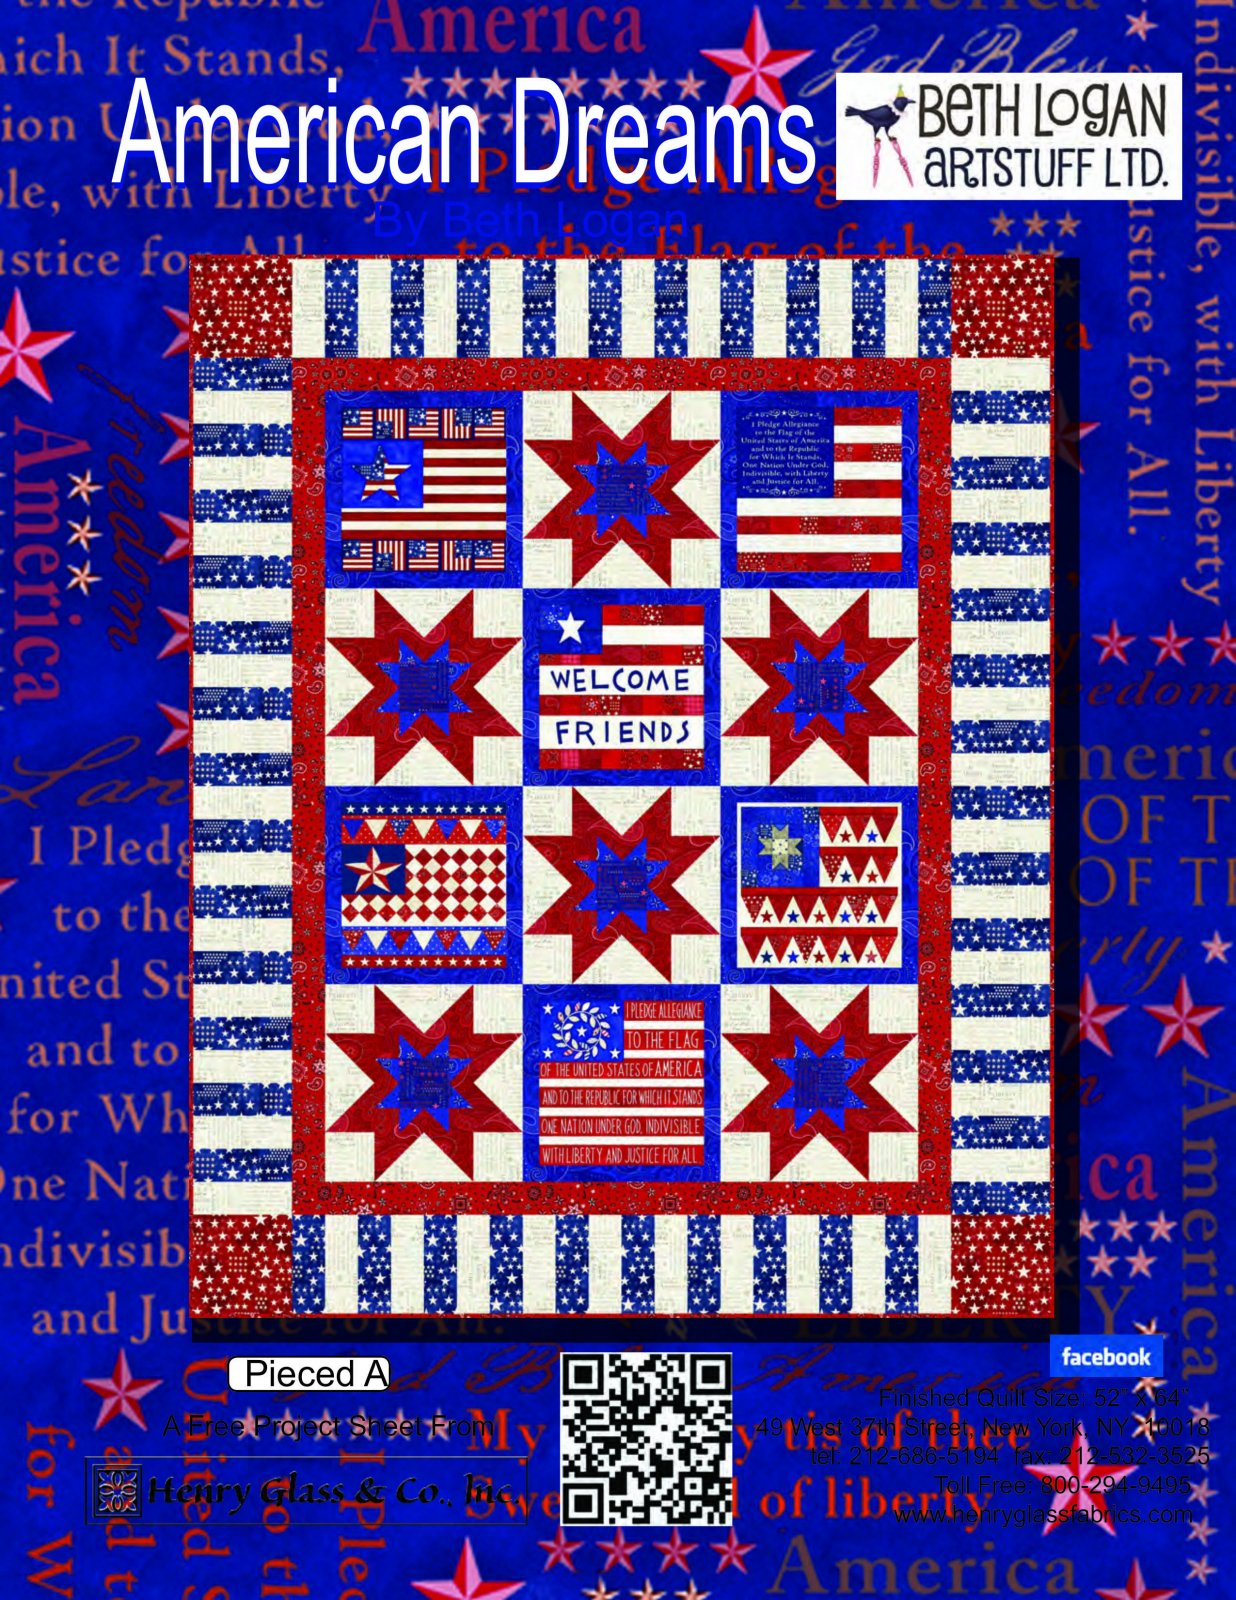 All American Dreams Kit